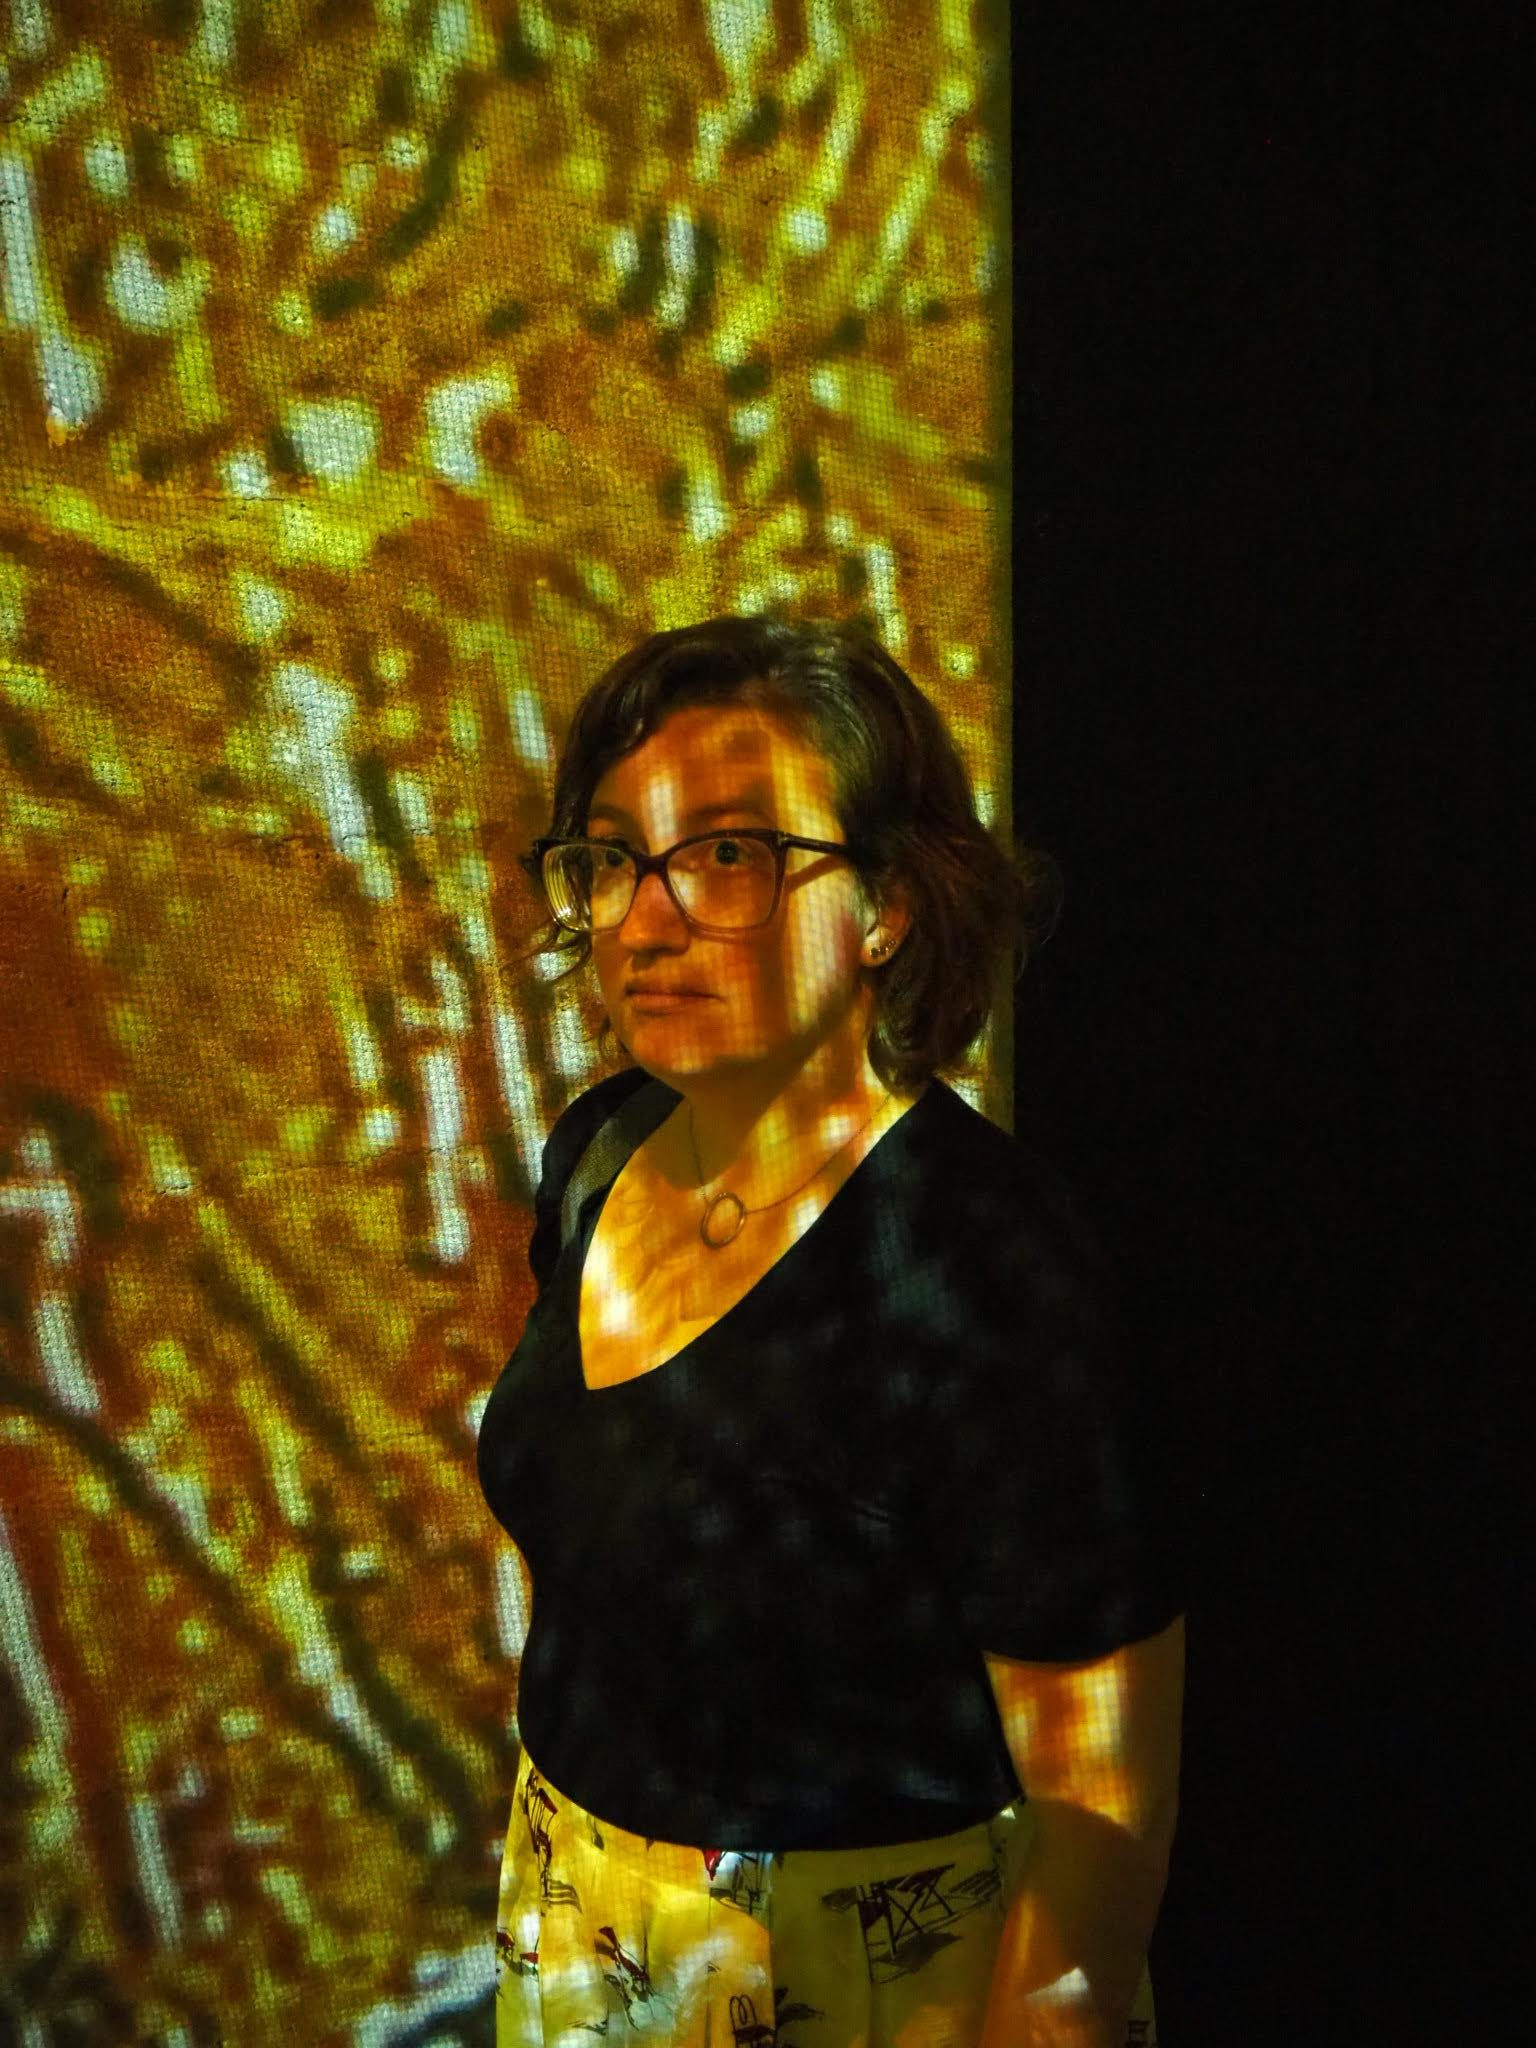 Claire Marie Blaustein